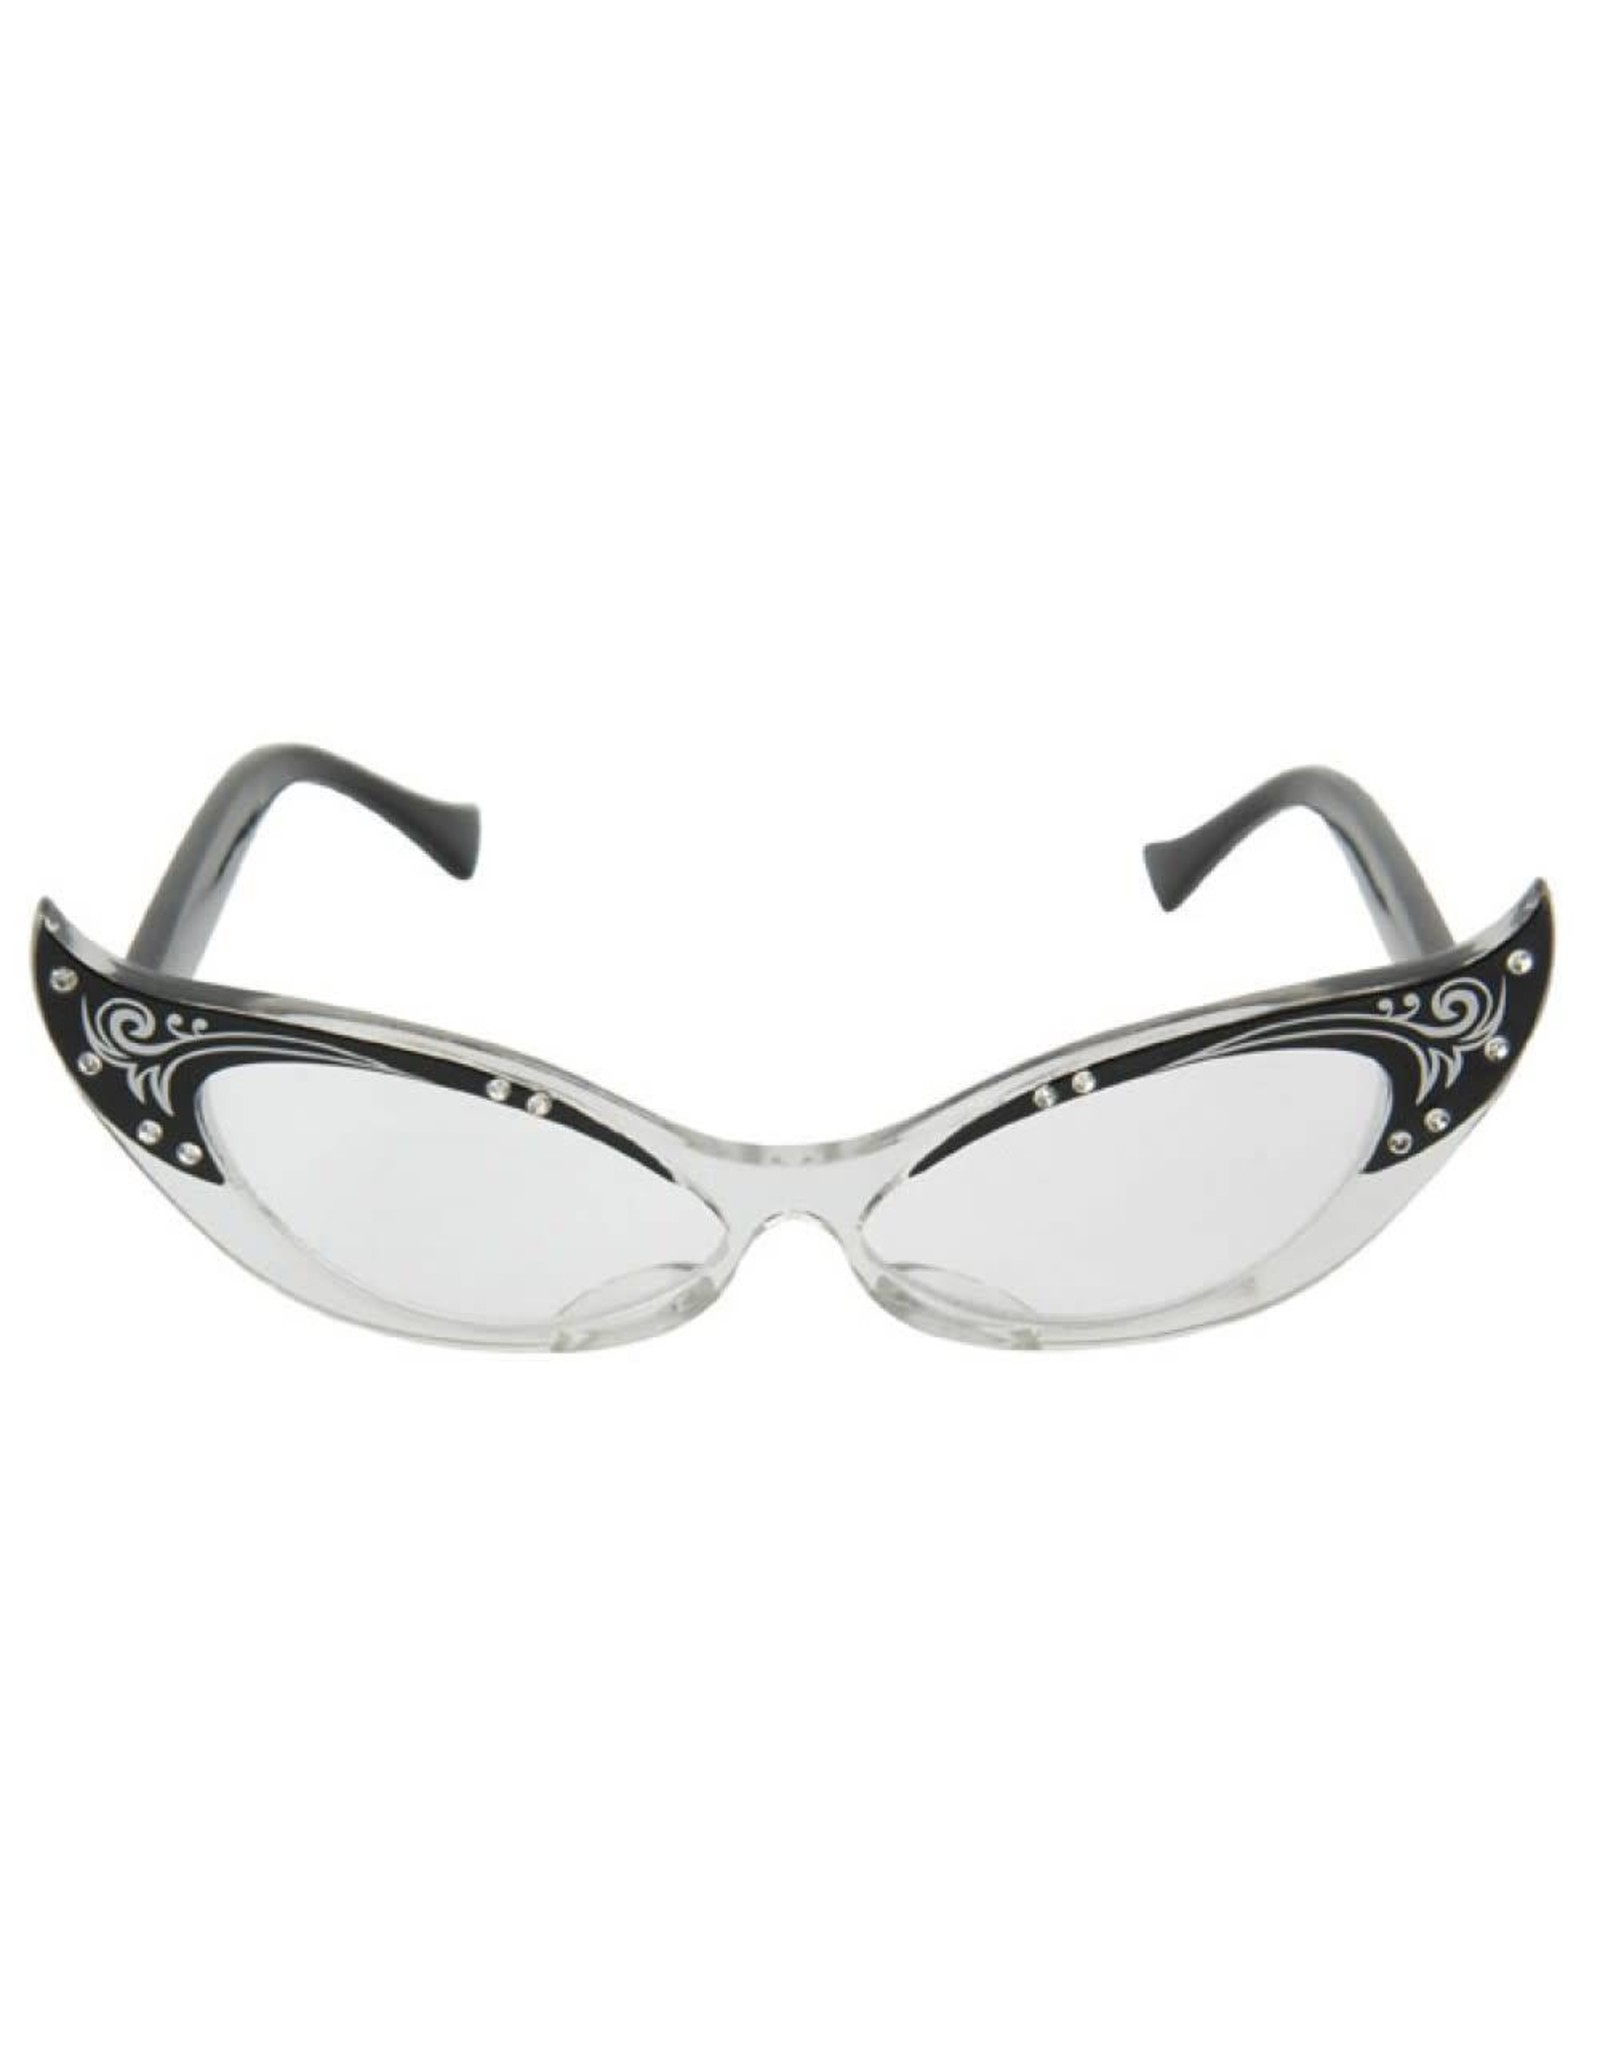 Elope Vintage Cat Eye Glasses